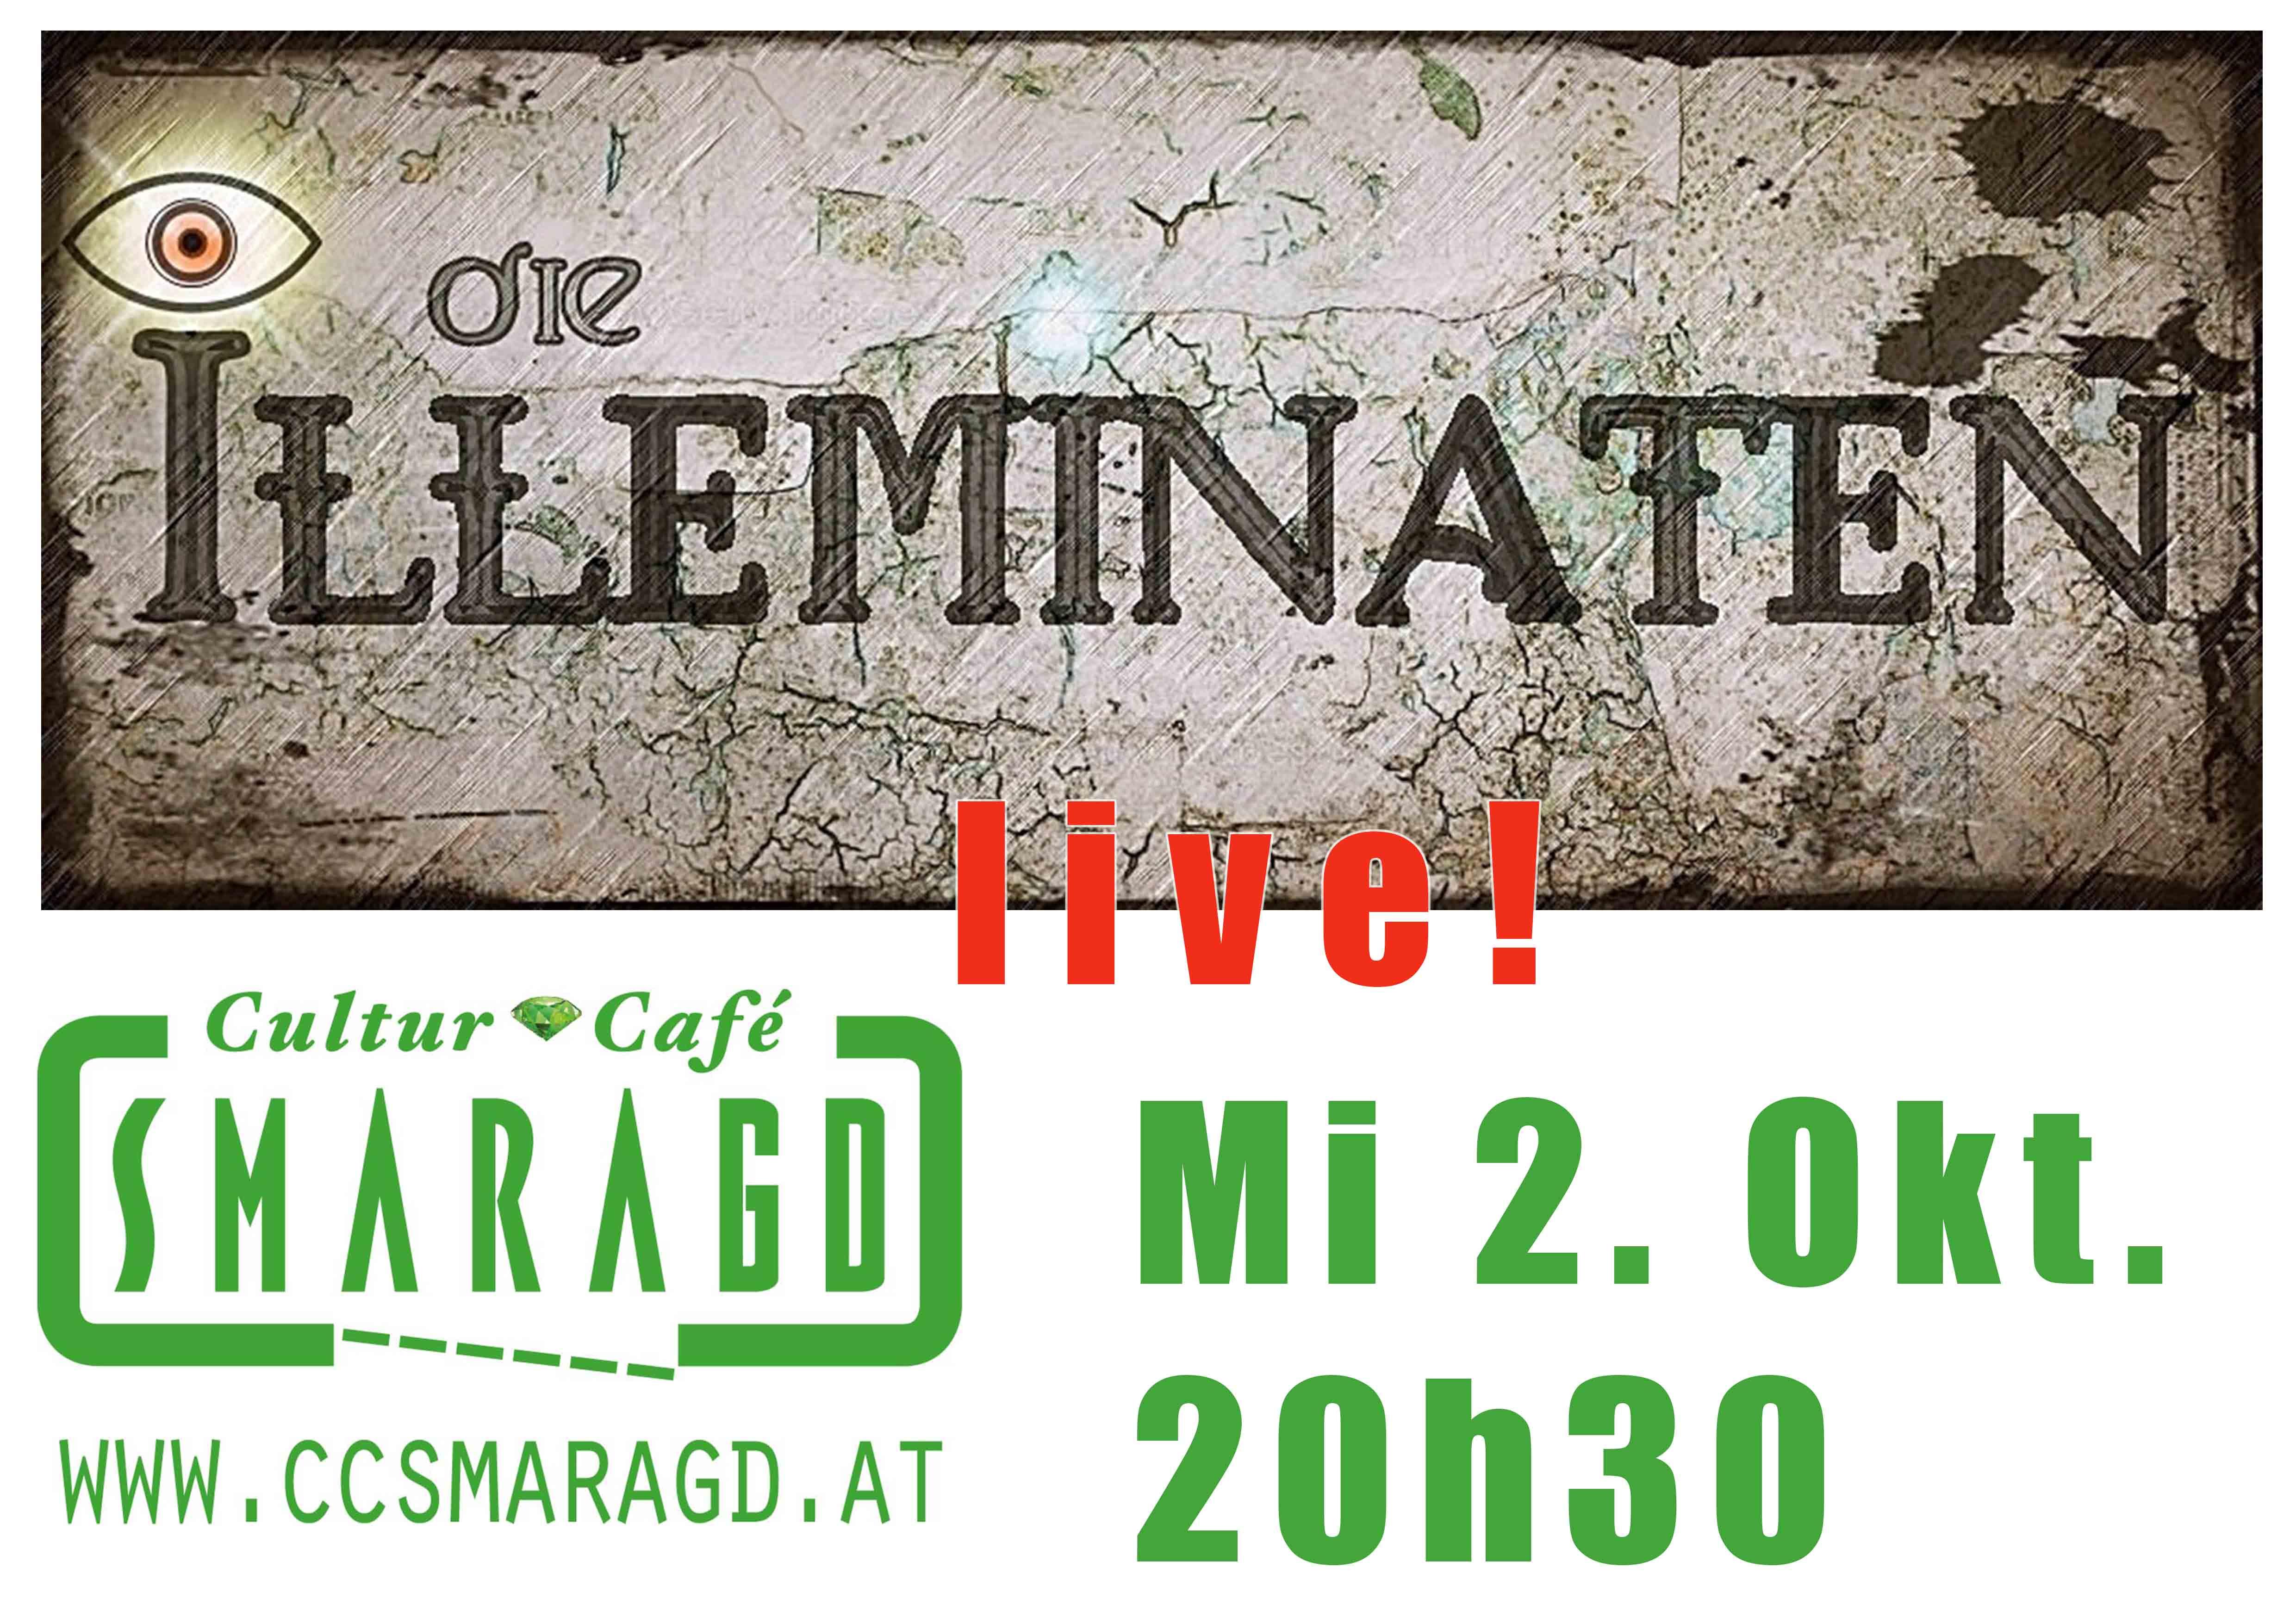 ccsmaragd-linz-illeminaten